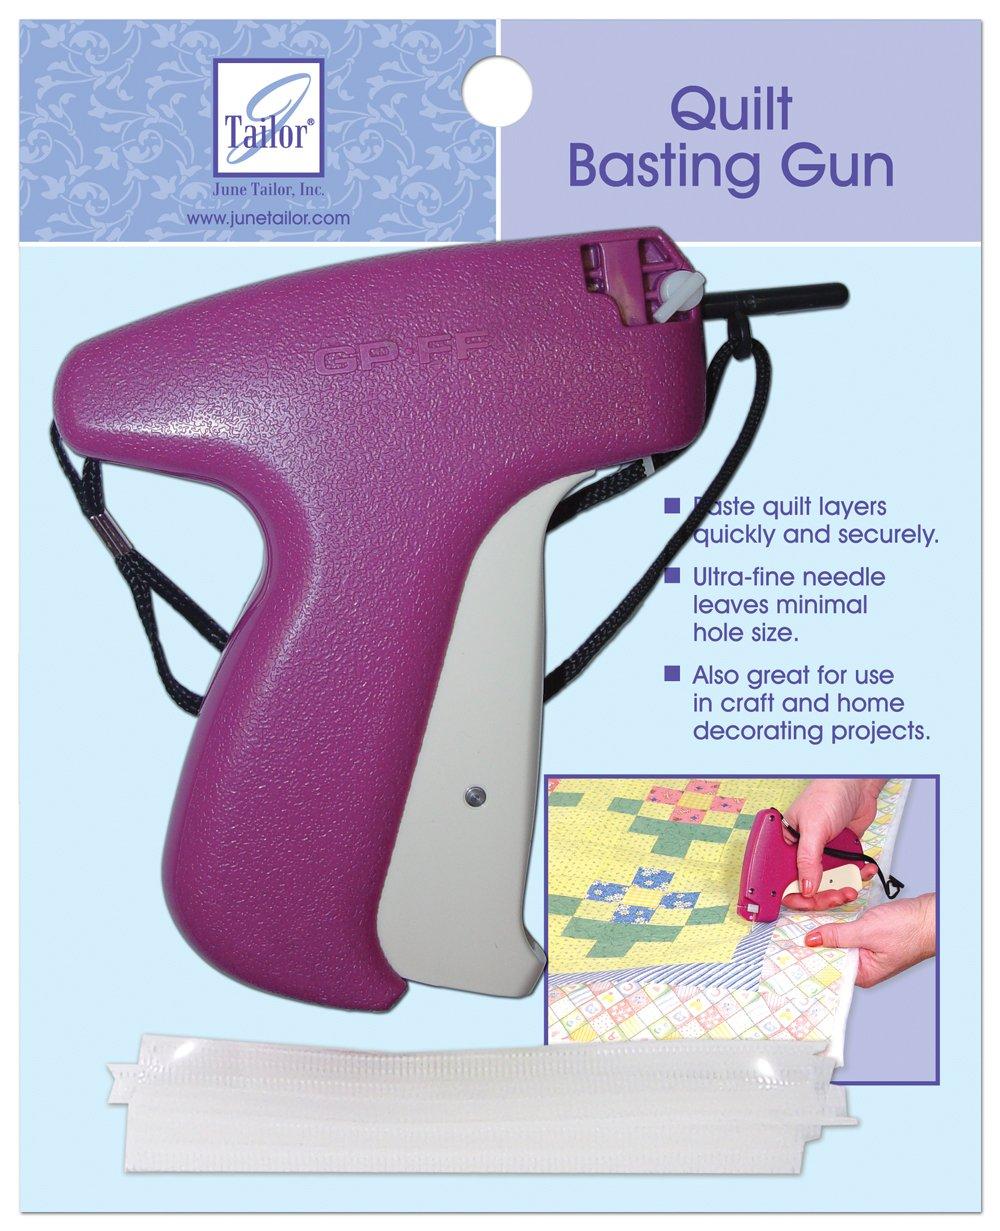 June Tailor Quilt Basting Gun JT525